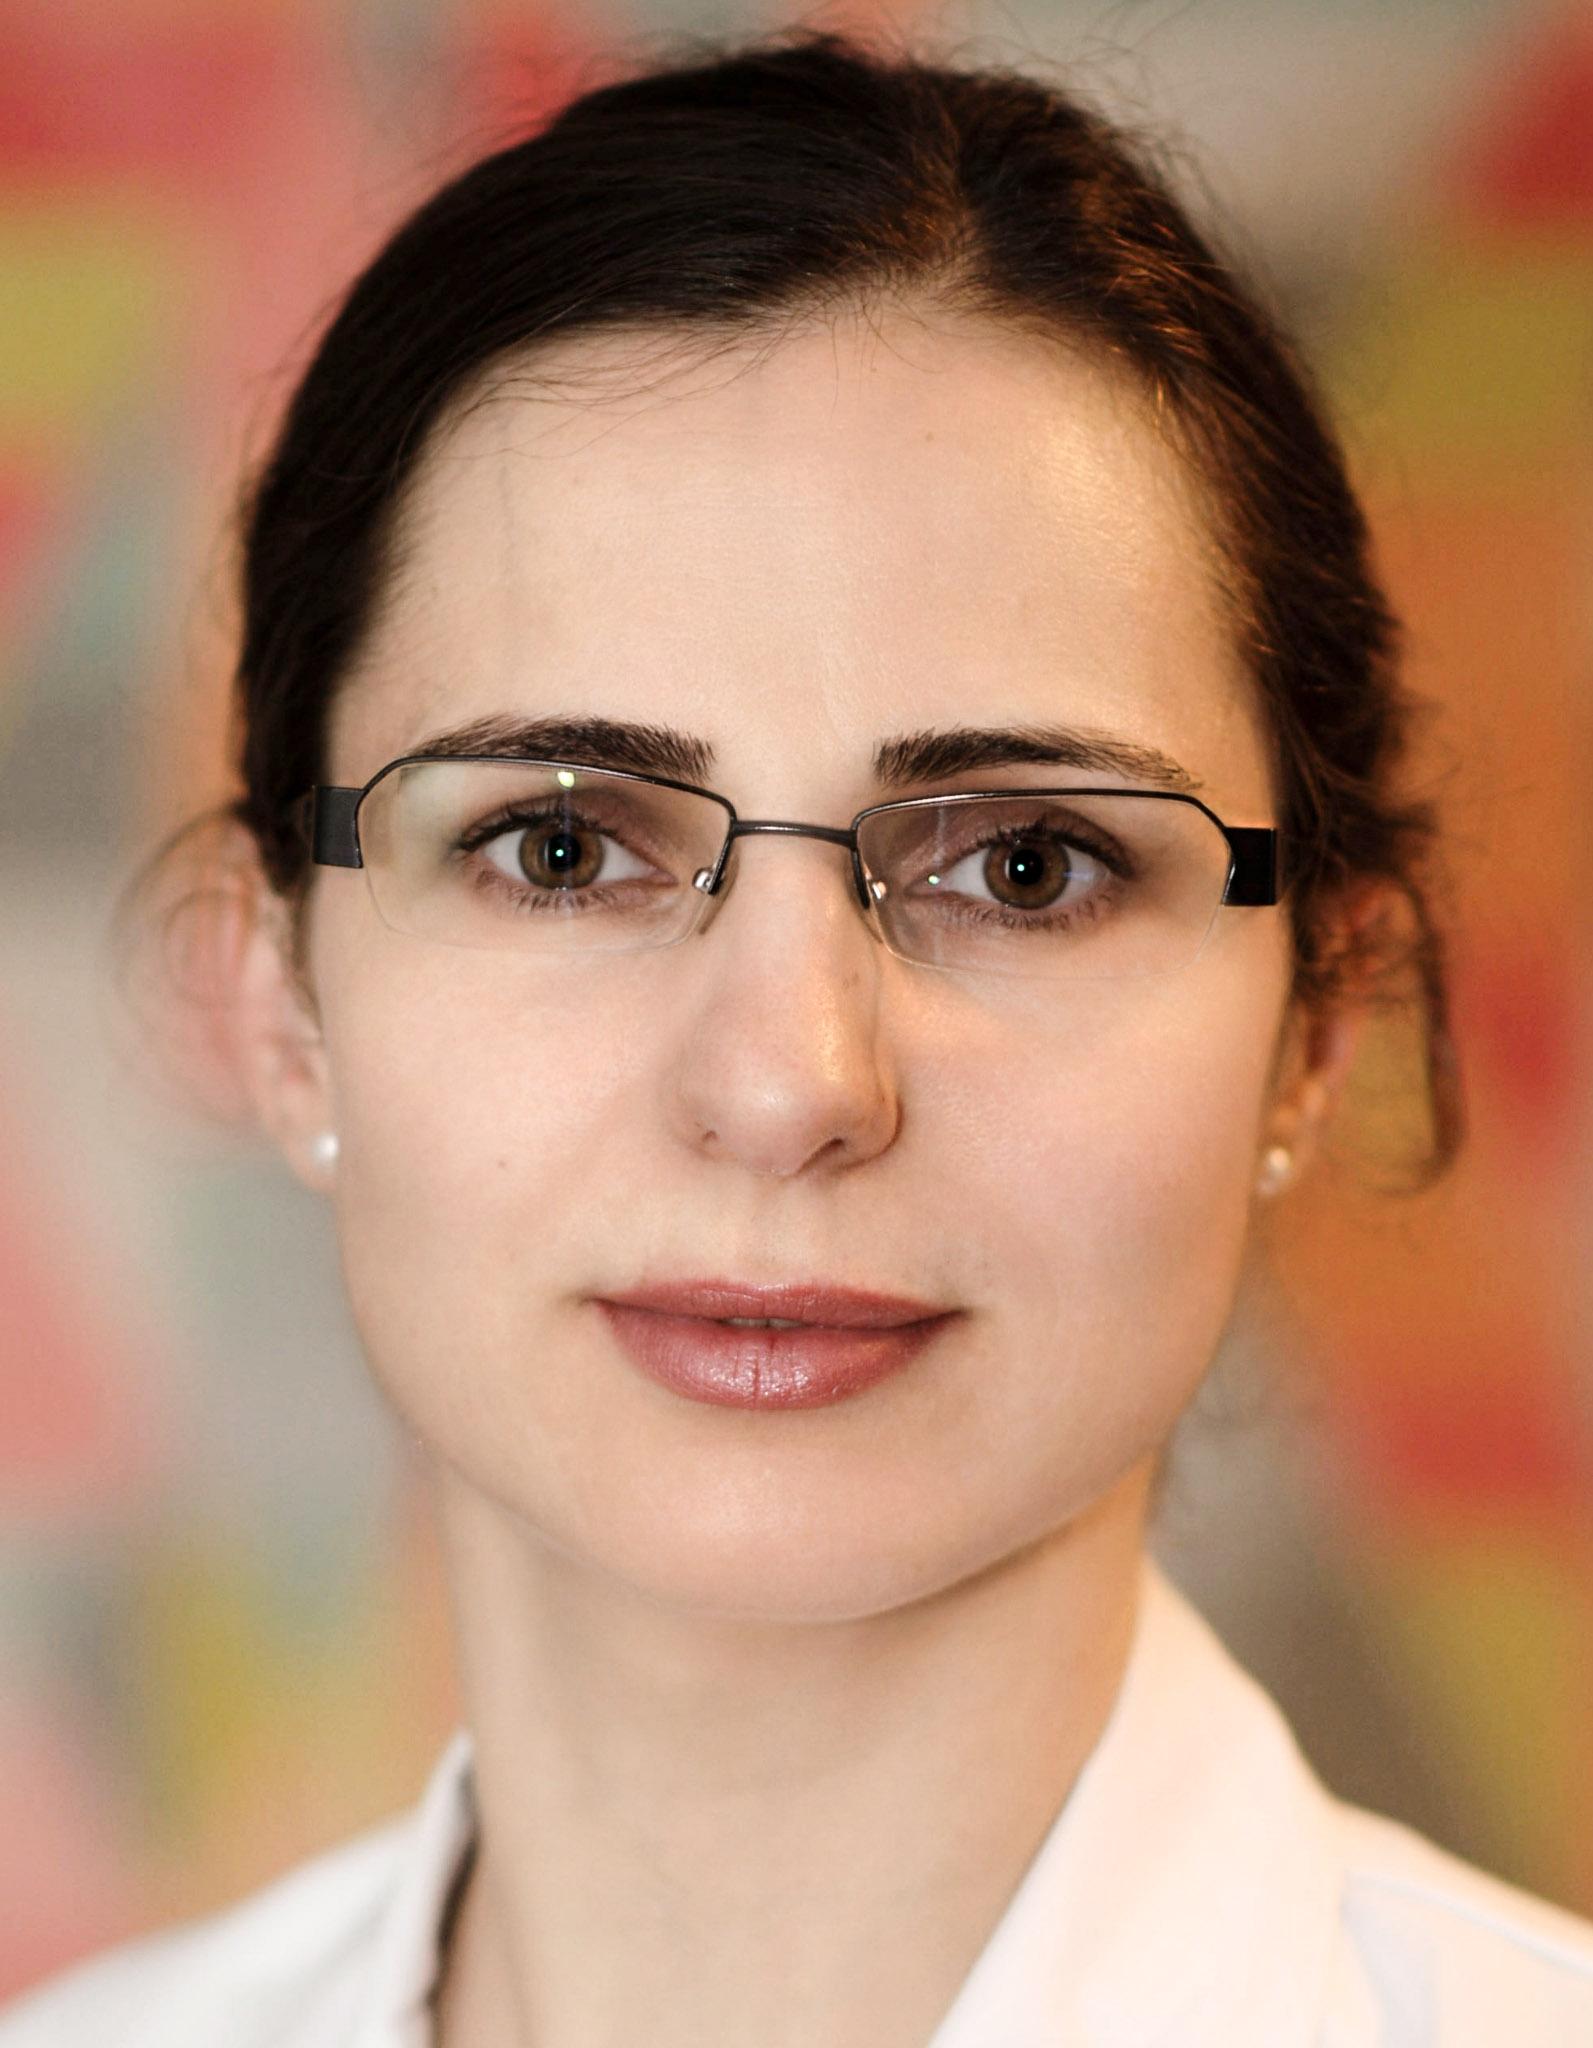 Dr. Florica Tomesc